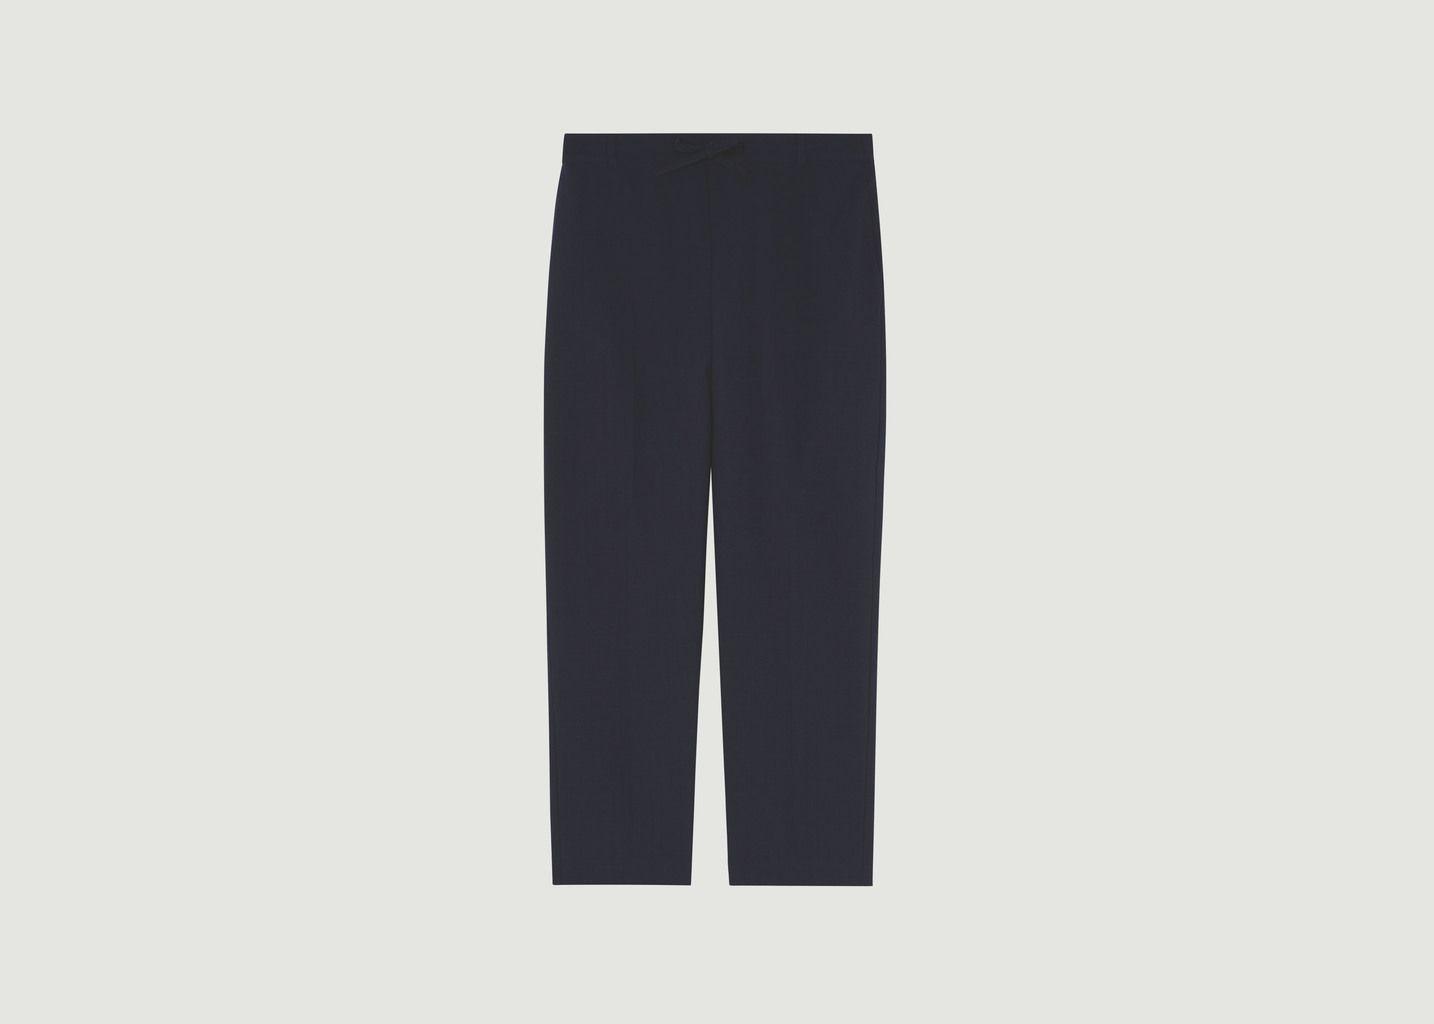 Pantalon Check City - Maison Kitsuné